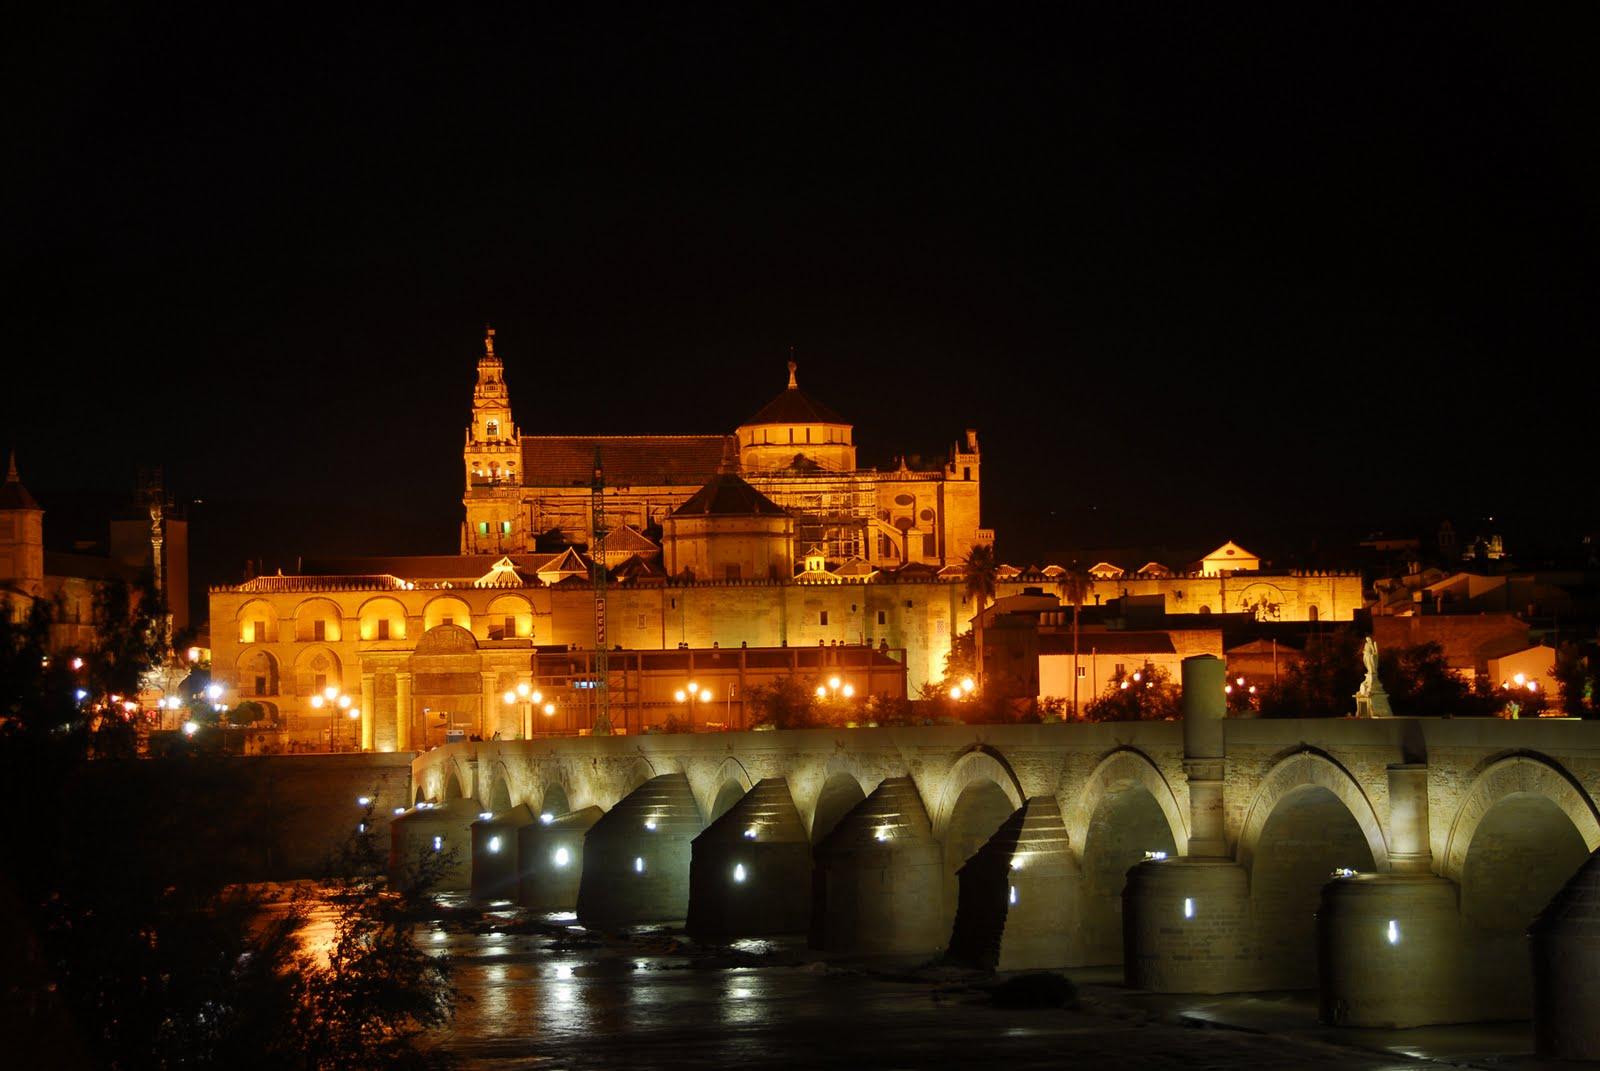 Entradas leyendas de c rdoba ruta nocturna - Visita mezquita cordoba nocturna ...